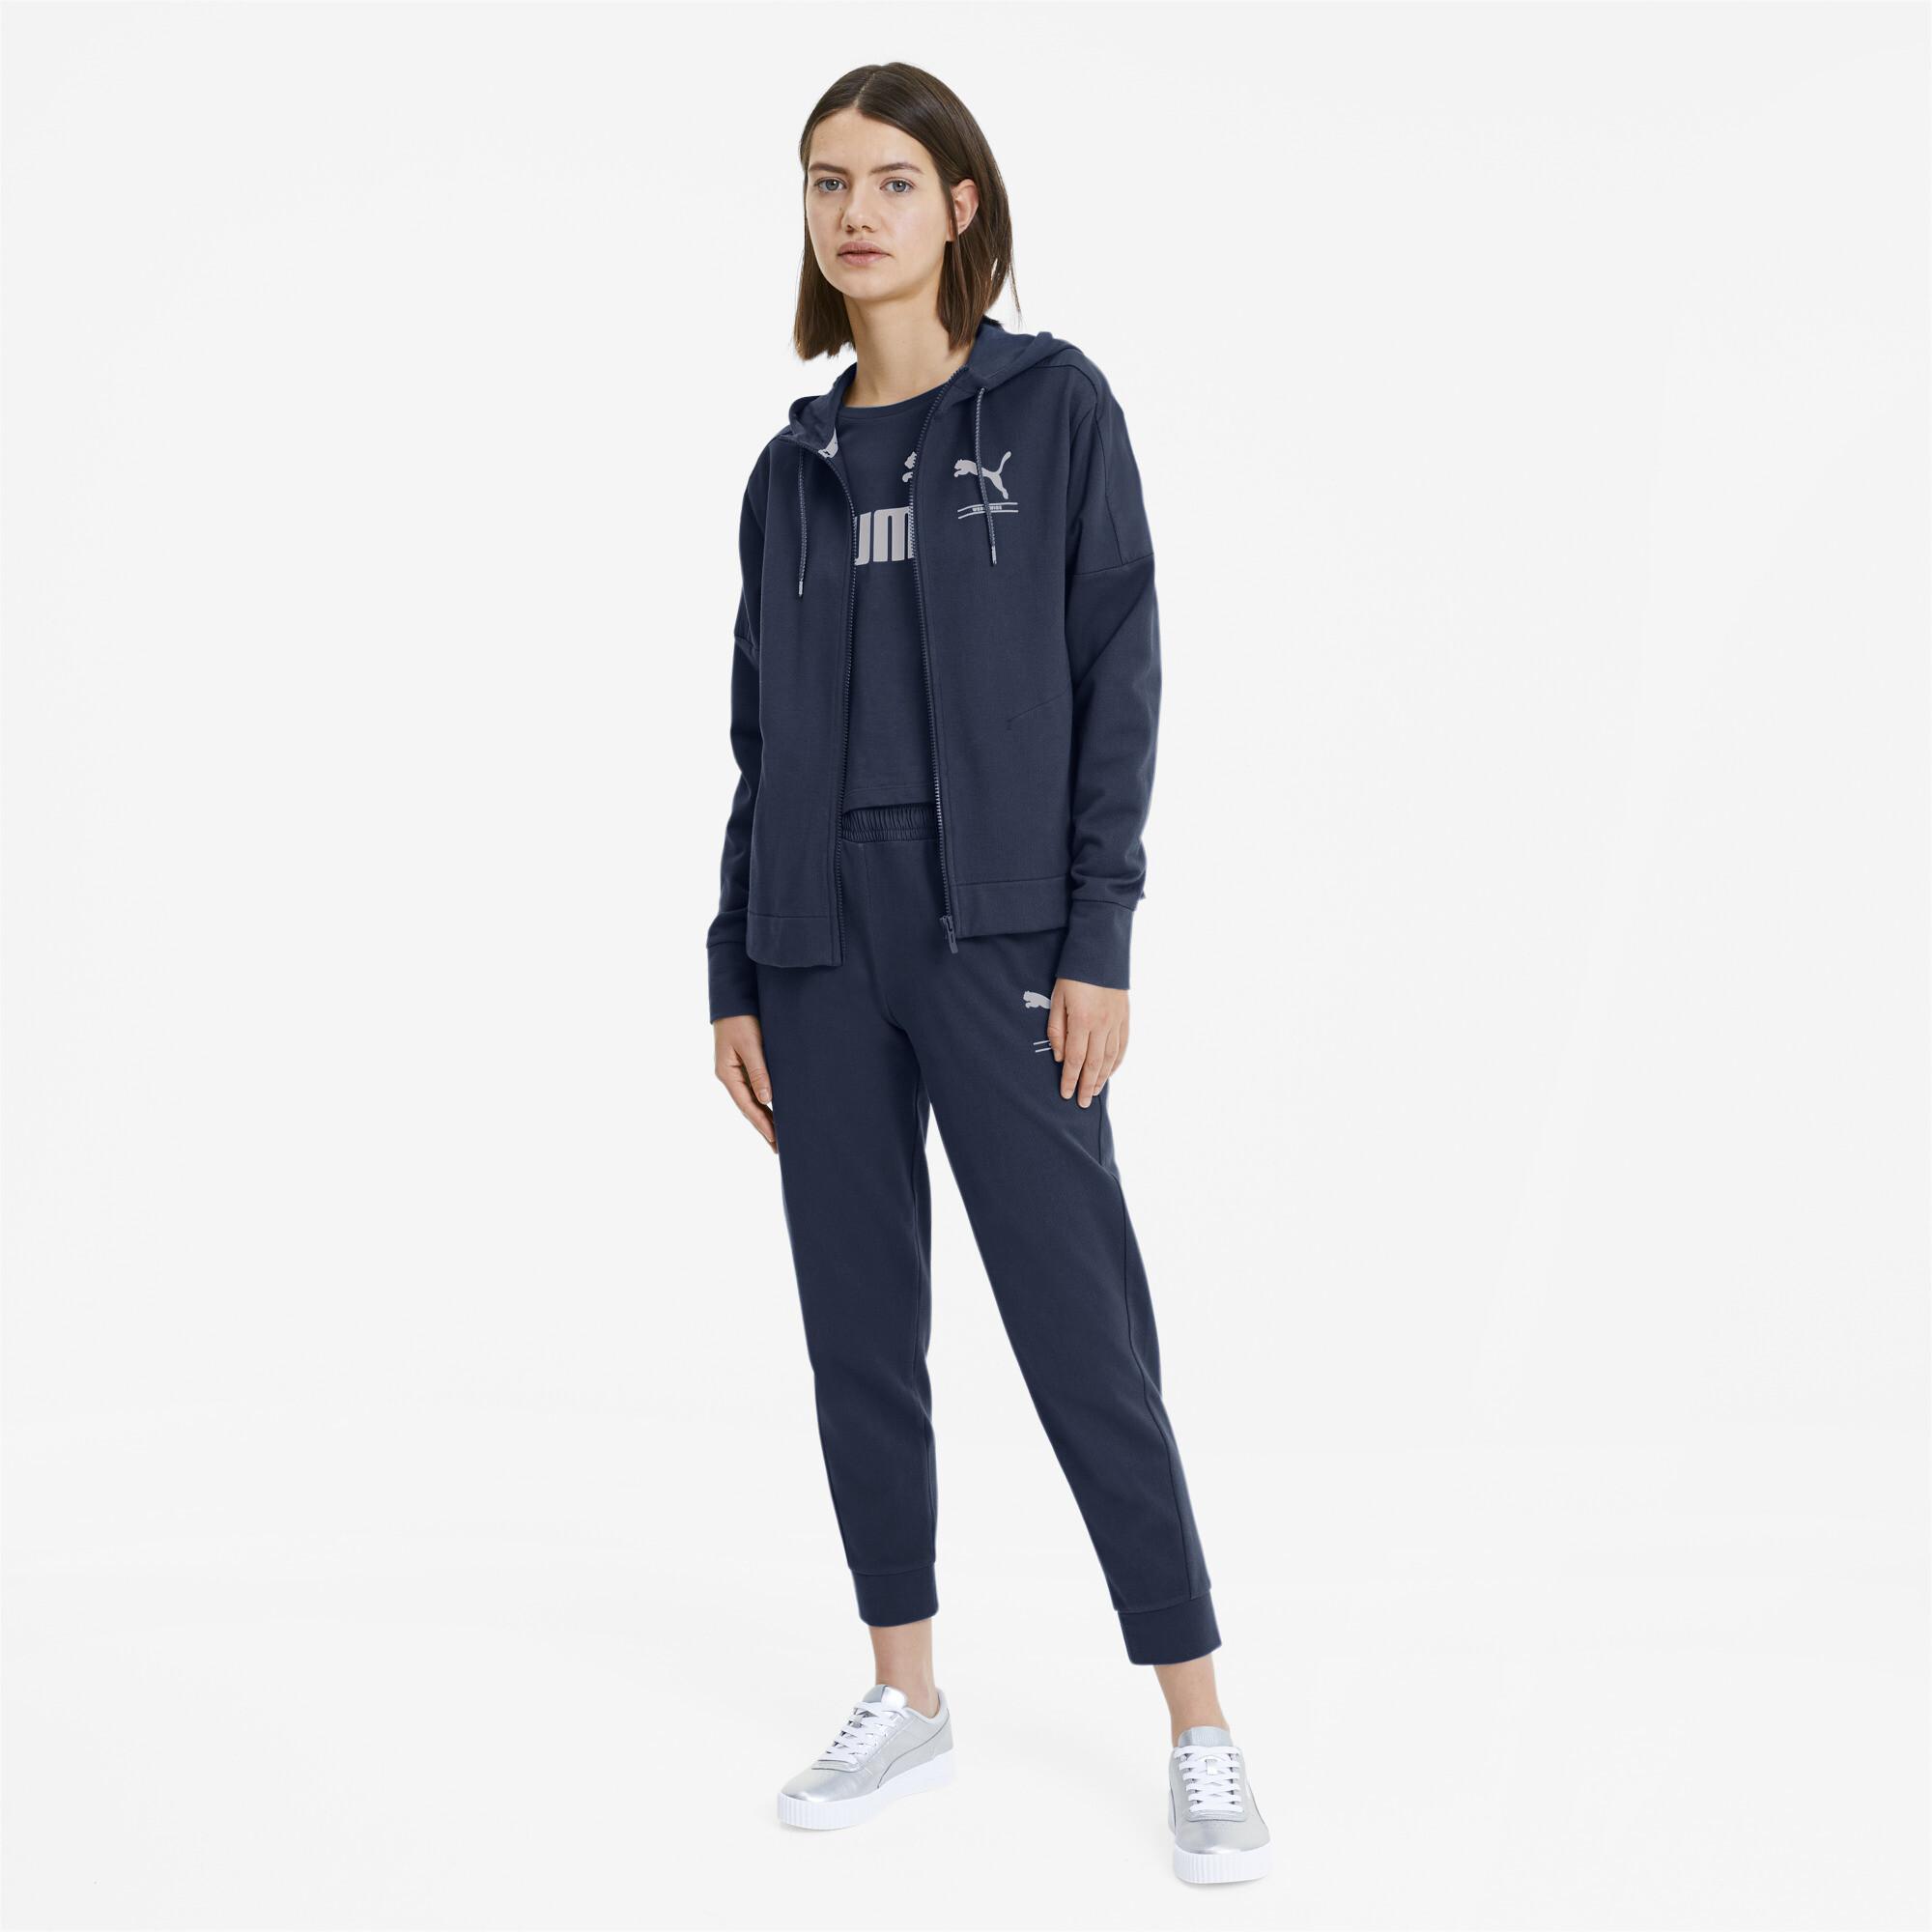 PUMA-NU-TILITY-Women-039-s-Full-Zip-Hoodie-Women-Sweat-Basics miniatuur 6